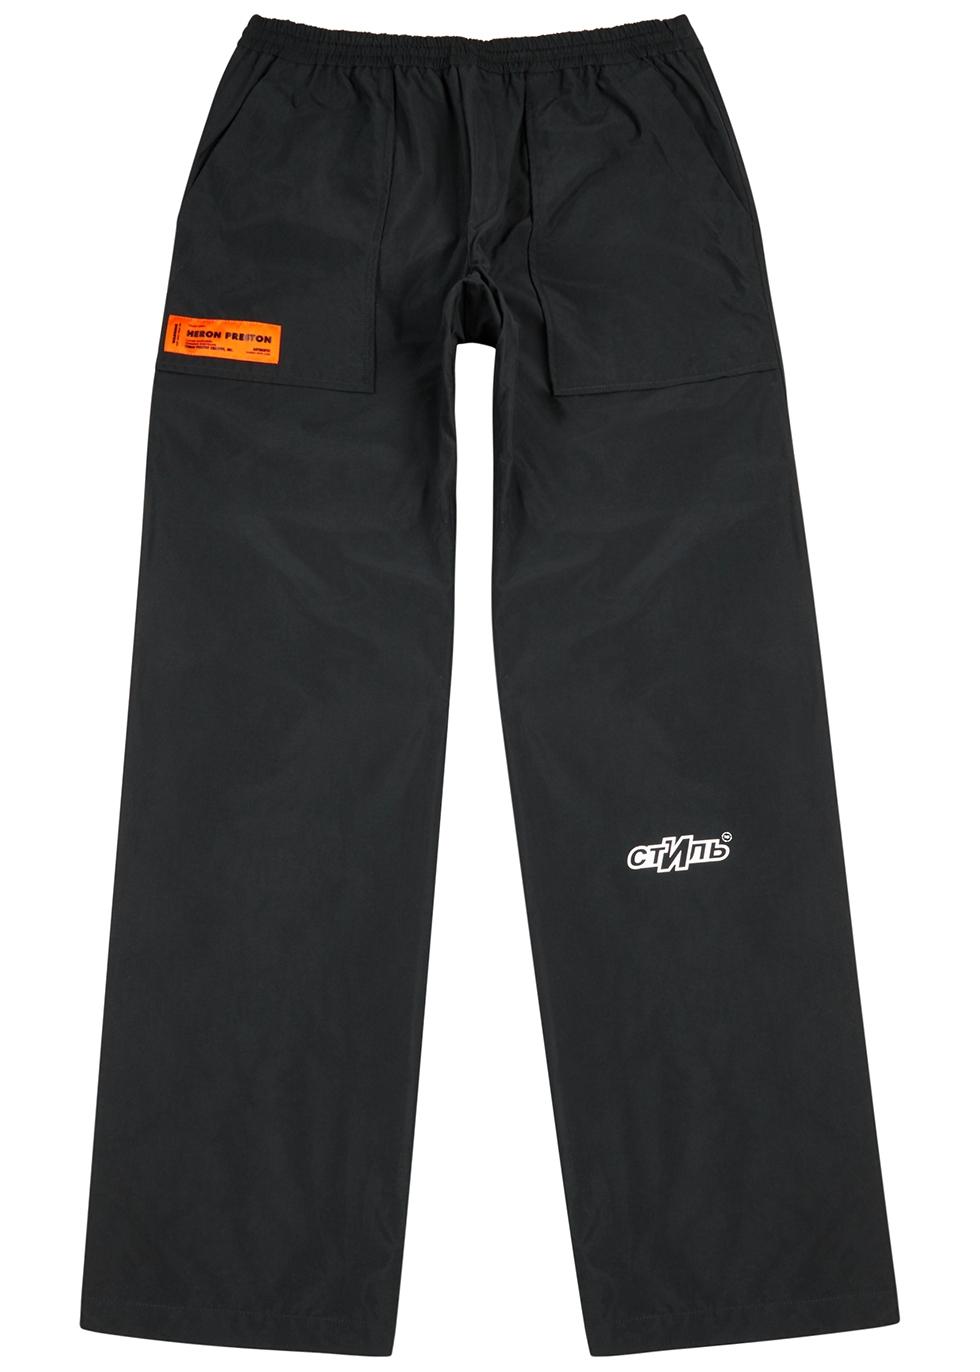 CTNMB black shell trousers